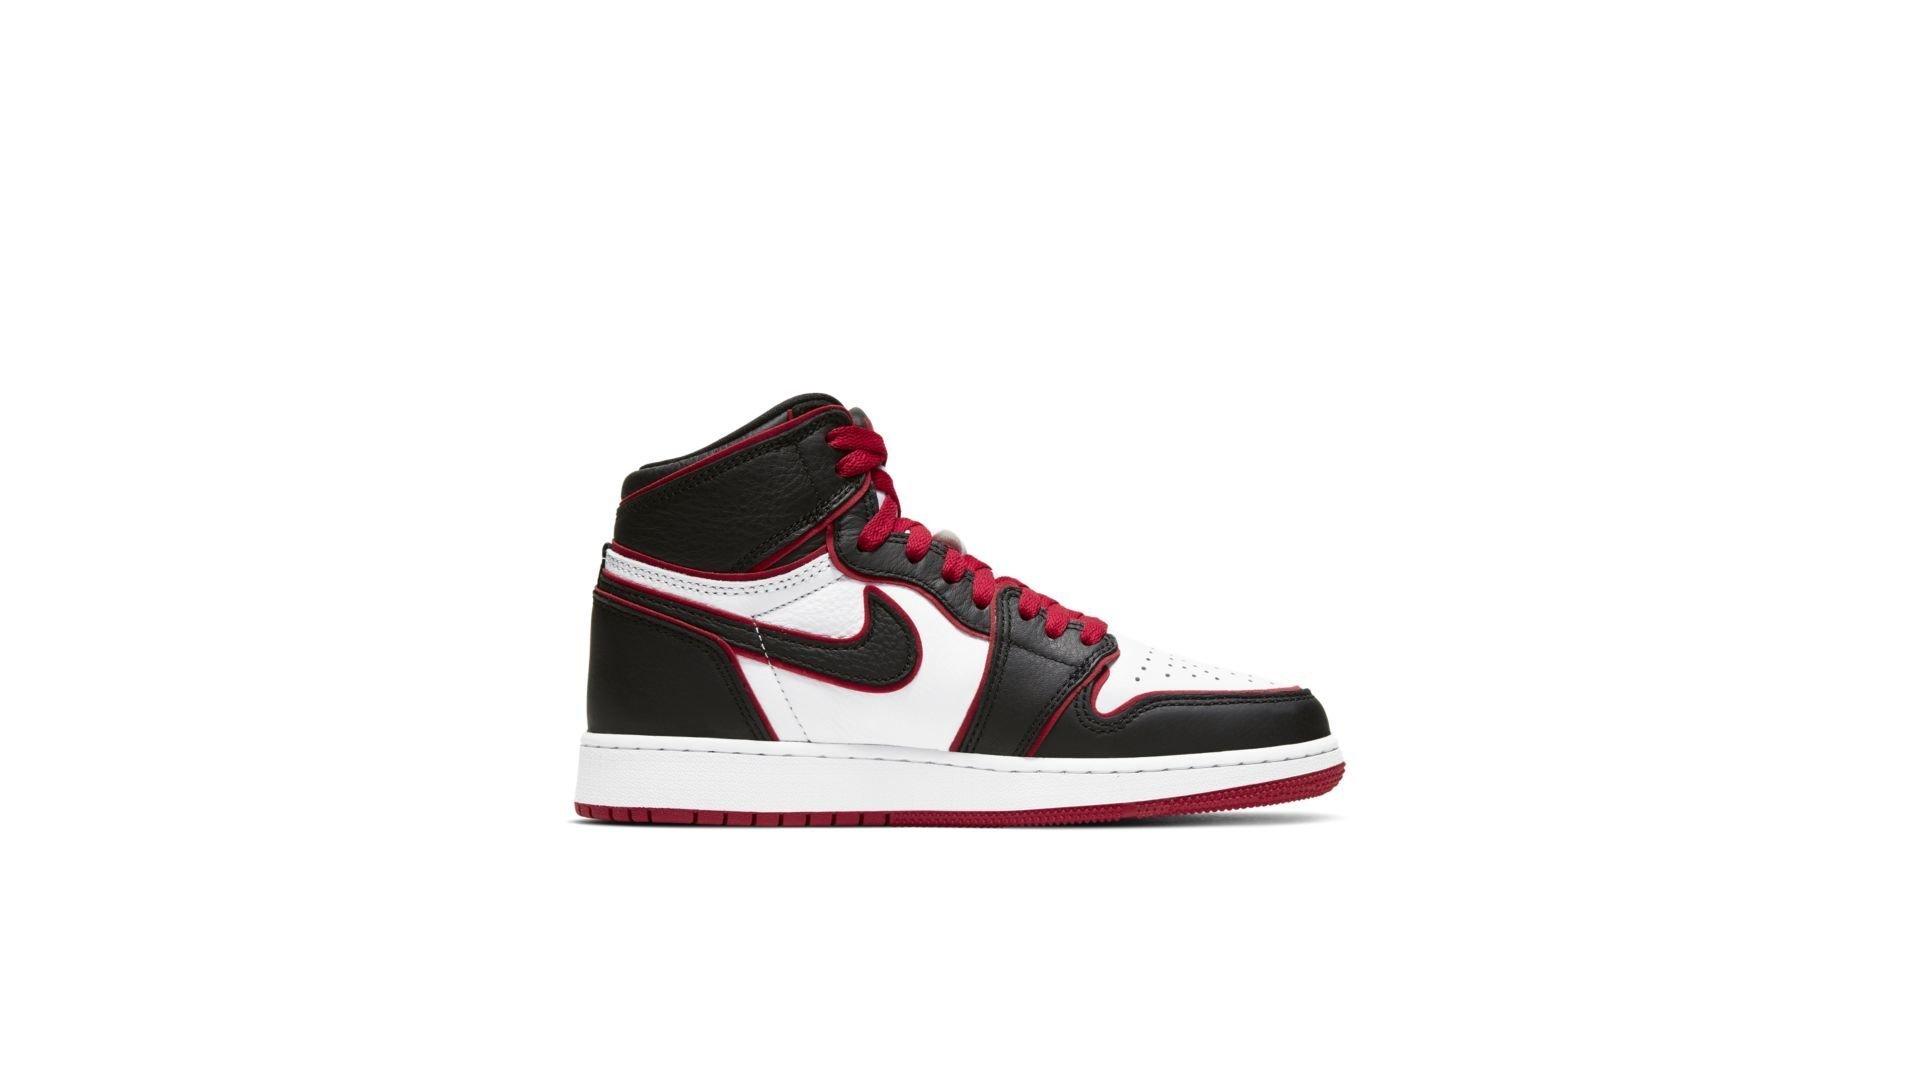 Jordan 1 Retro High Bloodline (GS) (575441-062)